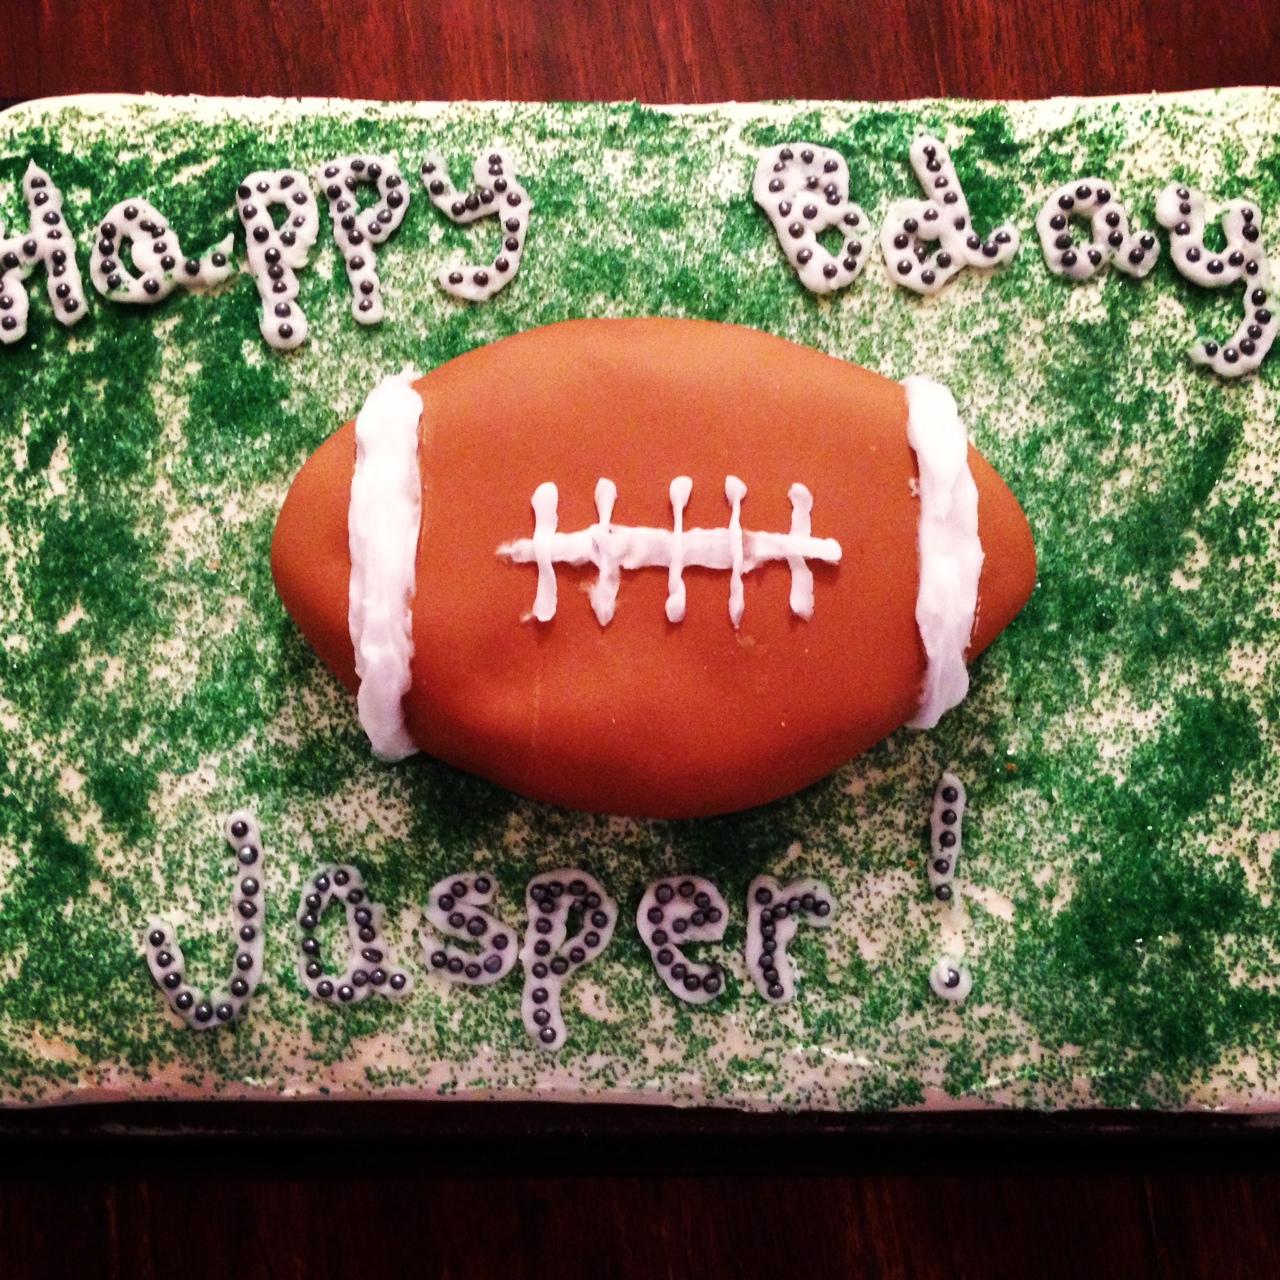 How Many Birthday Cakes Does A 9 Year Old Boy Need Photo